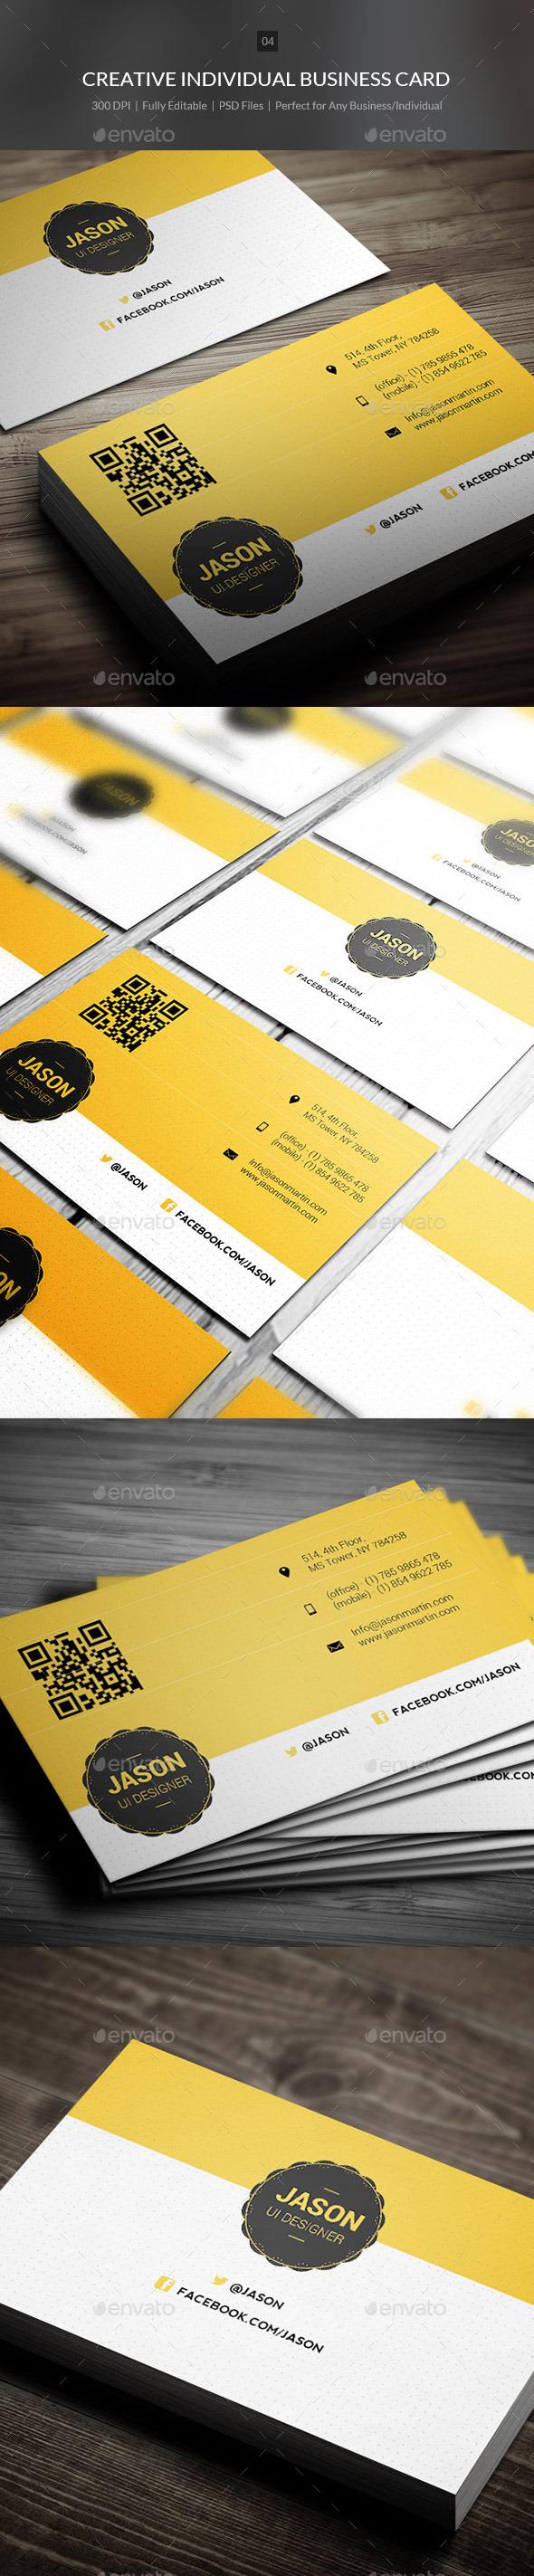 GraphicRiver Crearive Individual Business Card 04 10315311